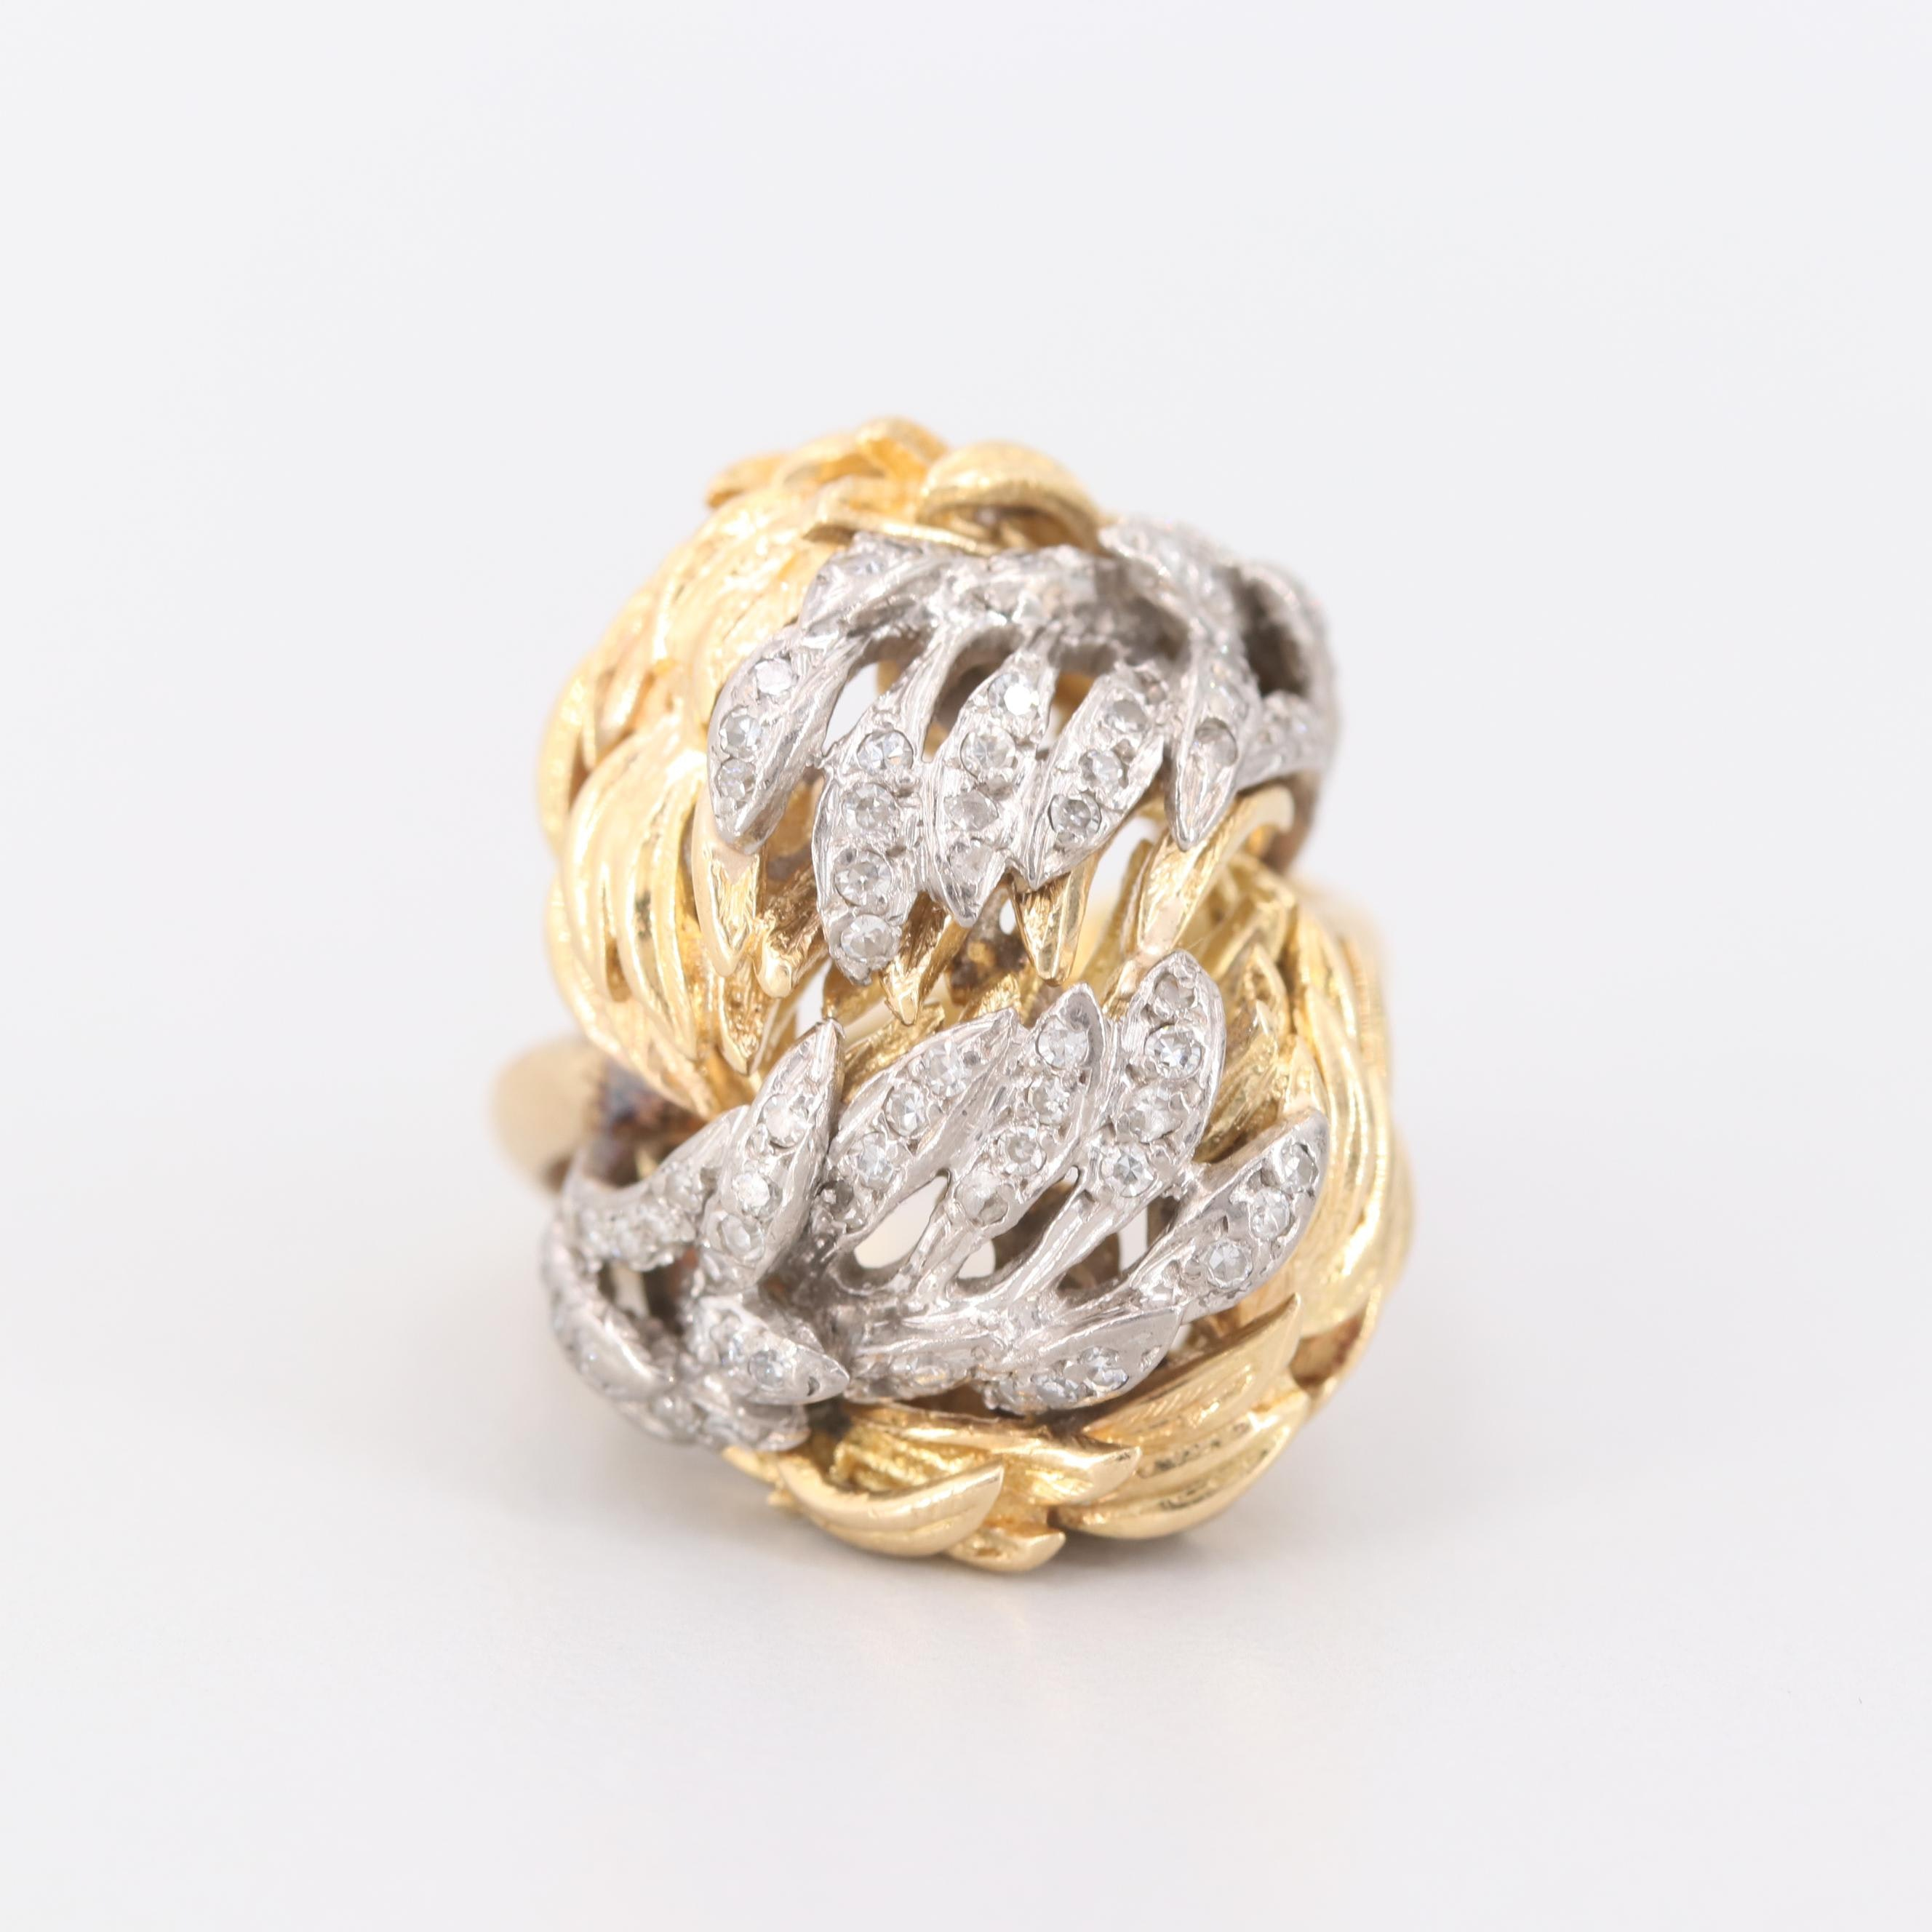 Vintage Rudi Cherny 18K Yellow and White Gold Diamond Ring